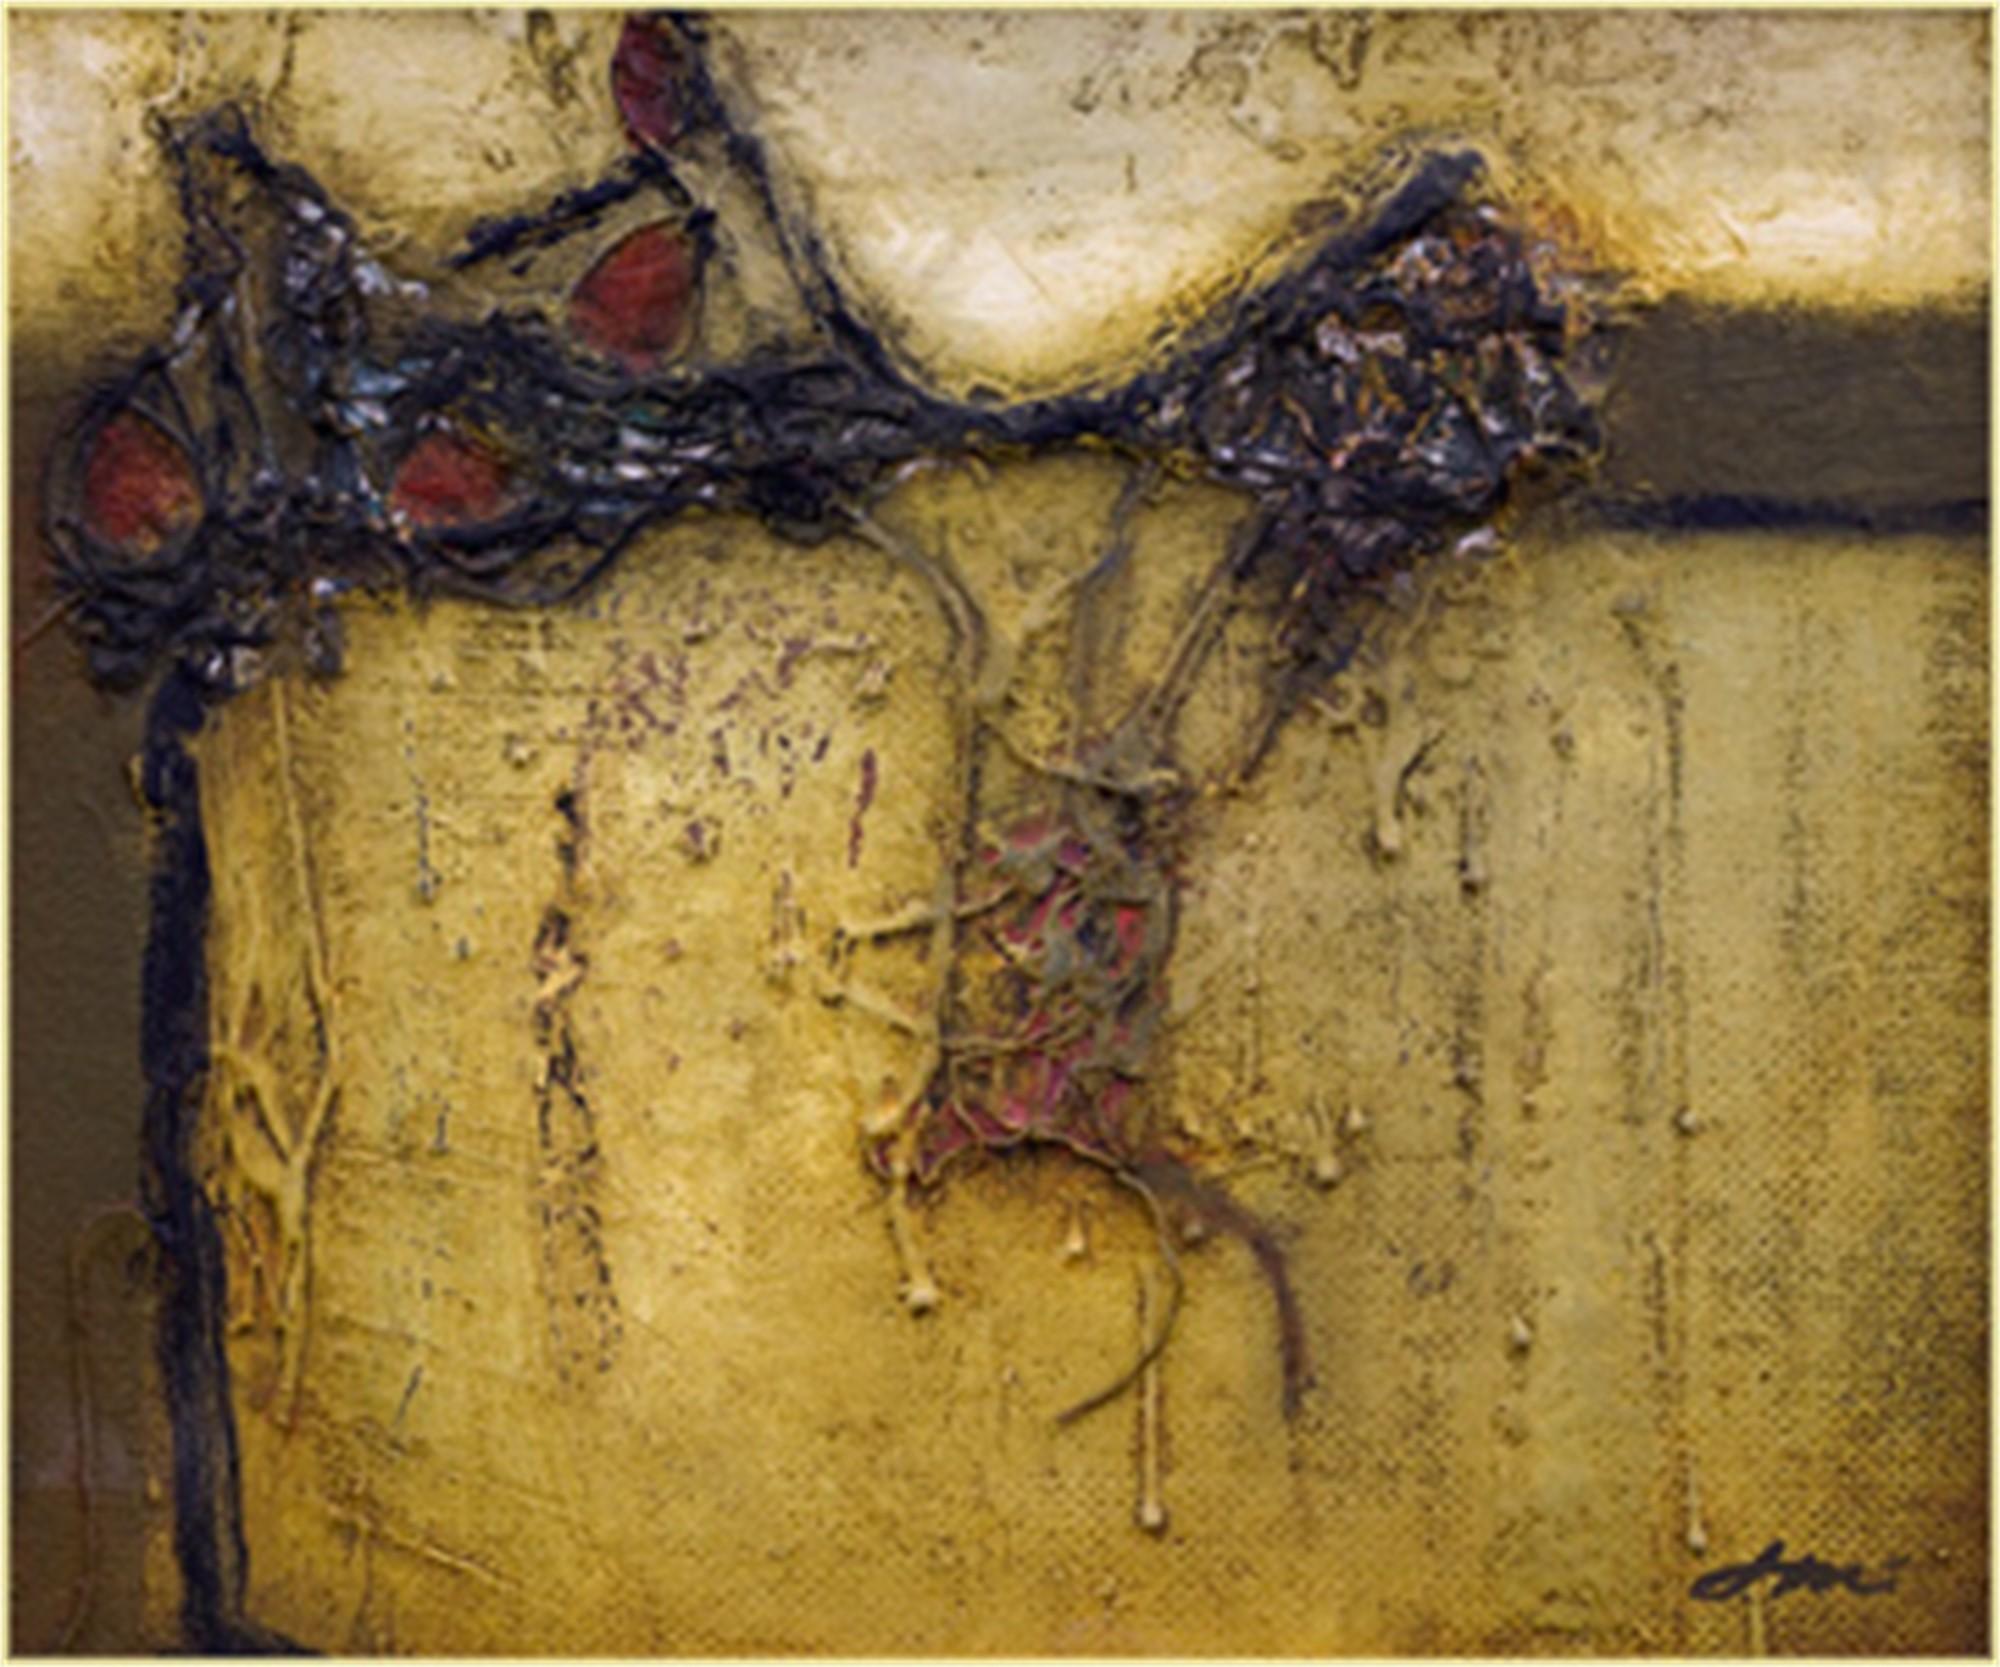 Illuminate by John McCaw